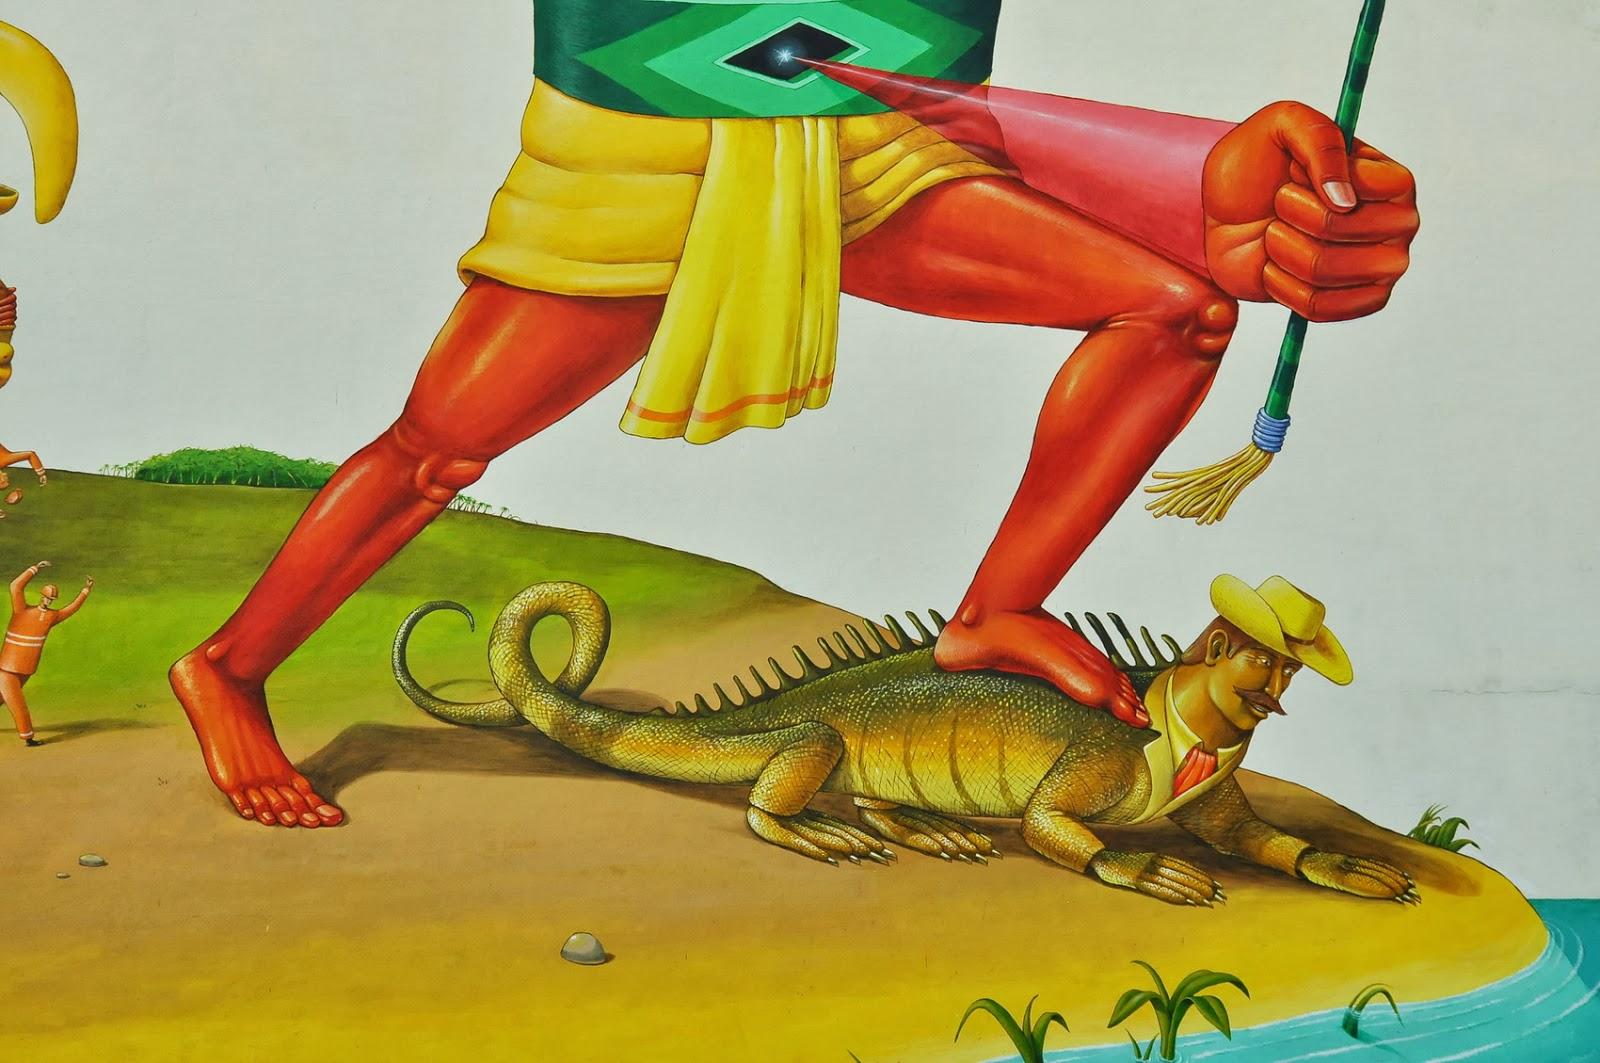 interesni-kazki-new-mural-campeche-mexico-10